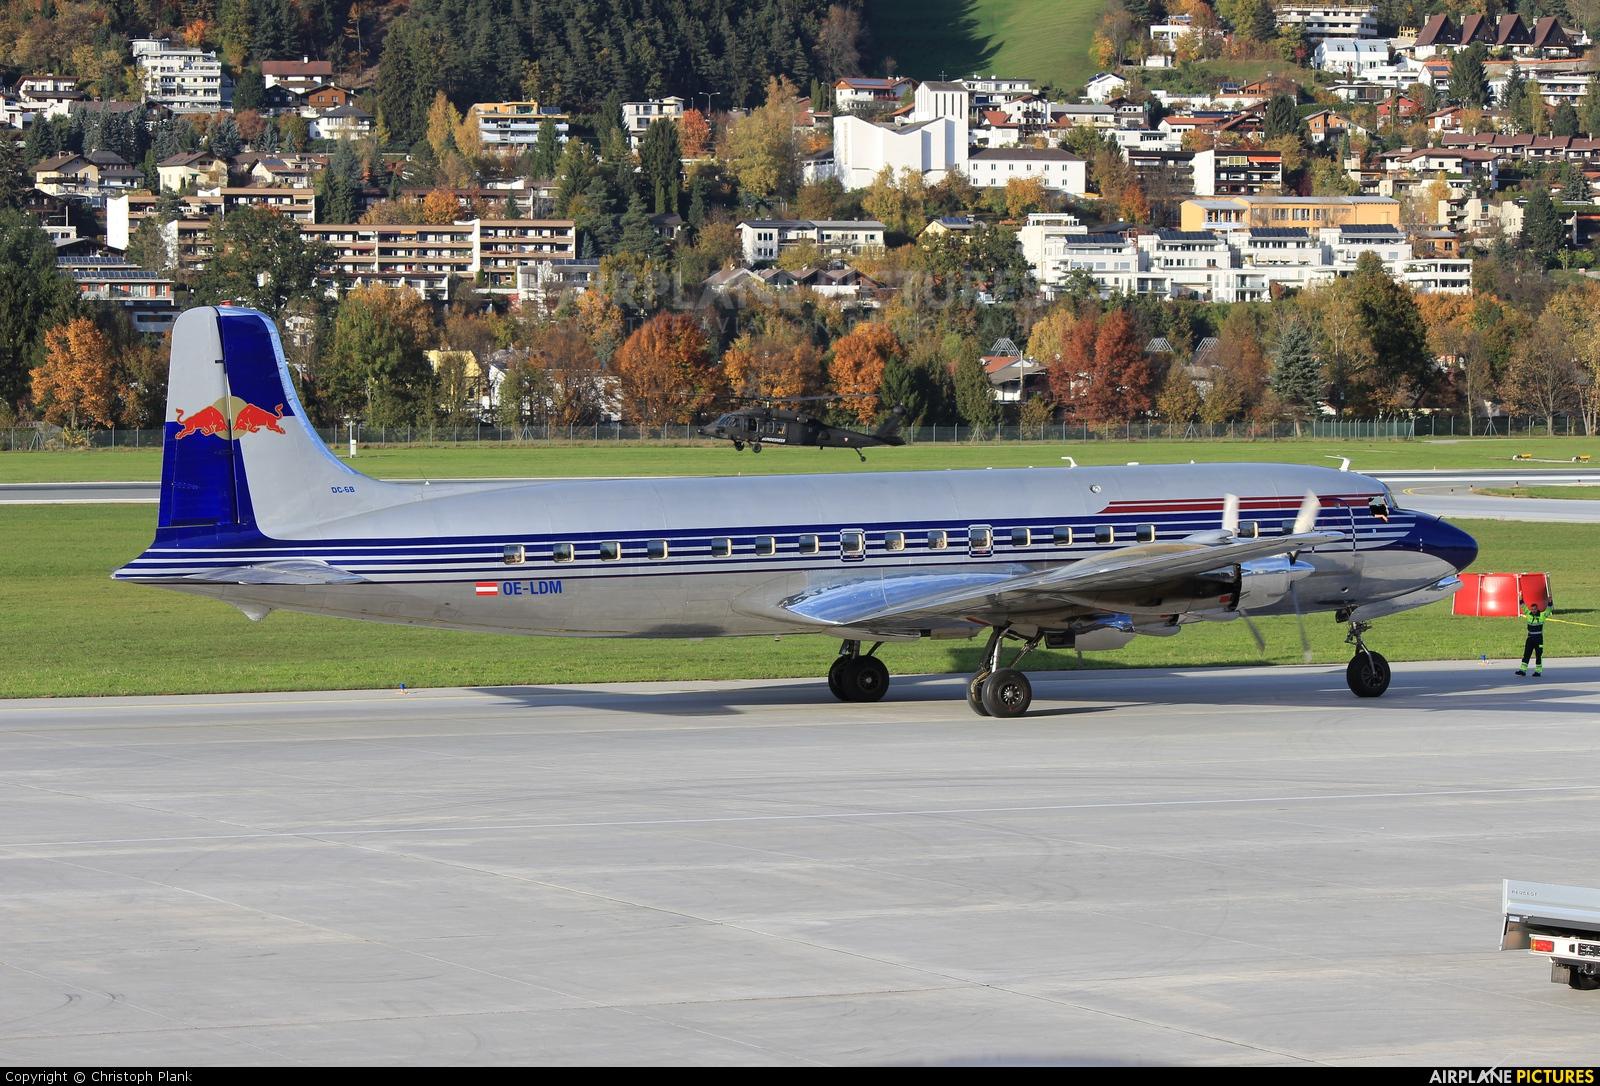 The Flying Bulls OE-LDM aircraft at Innsbruck